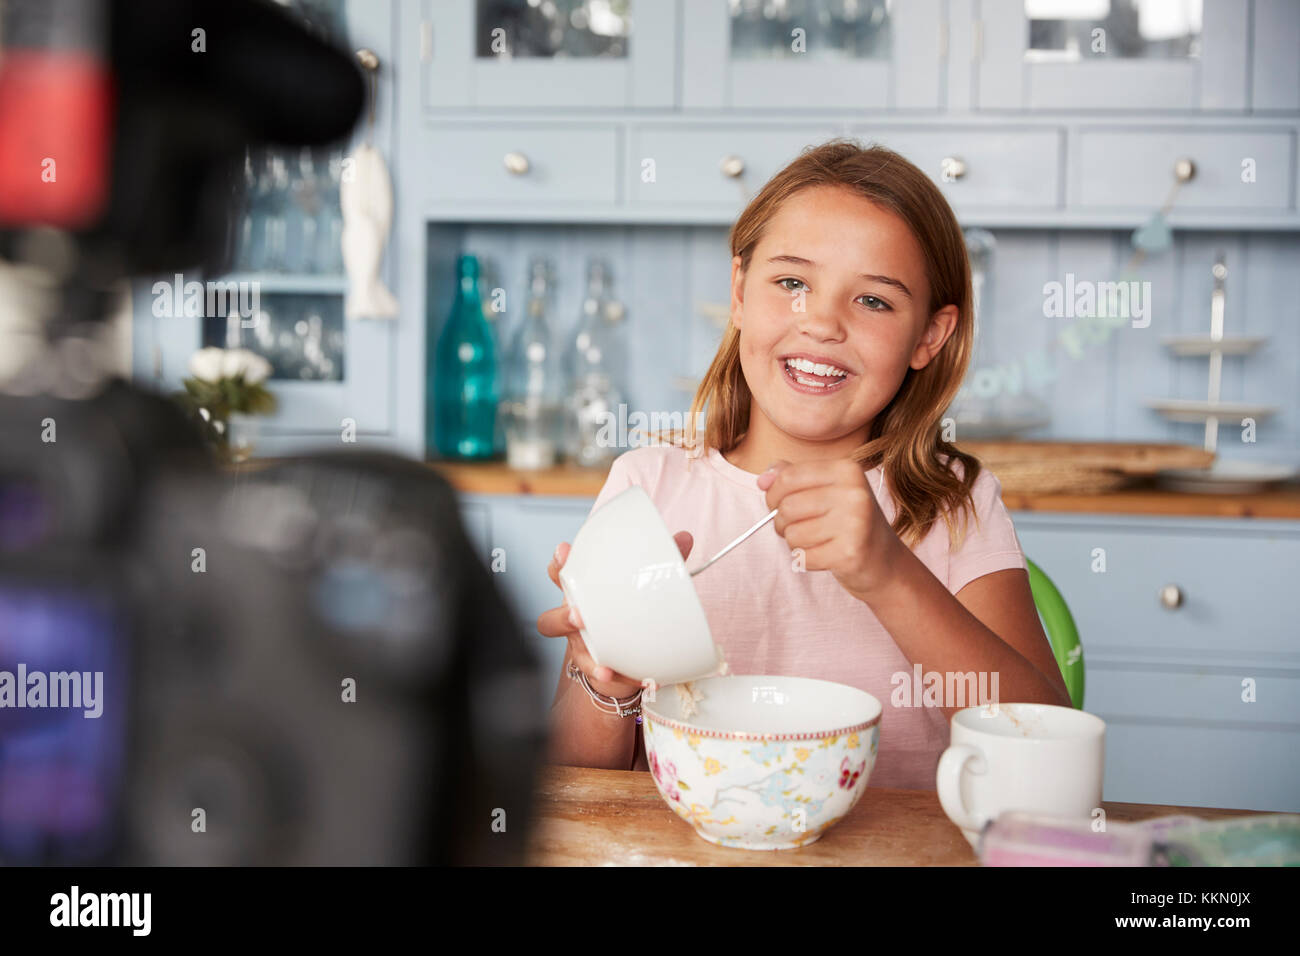 Pre-teen girl video blogging in kitchen mixing ingredients - Stock Image